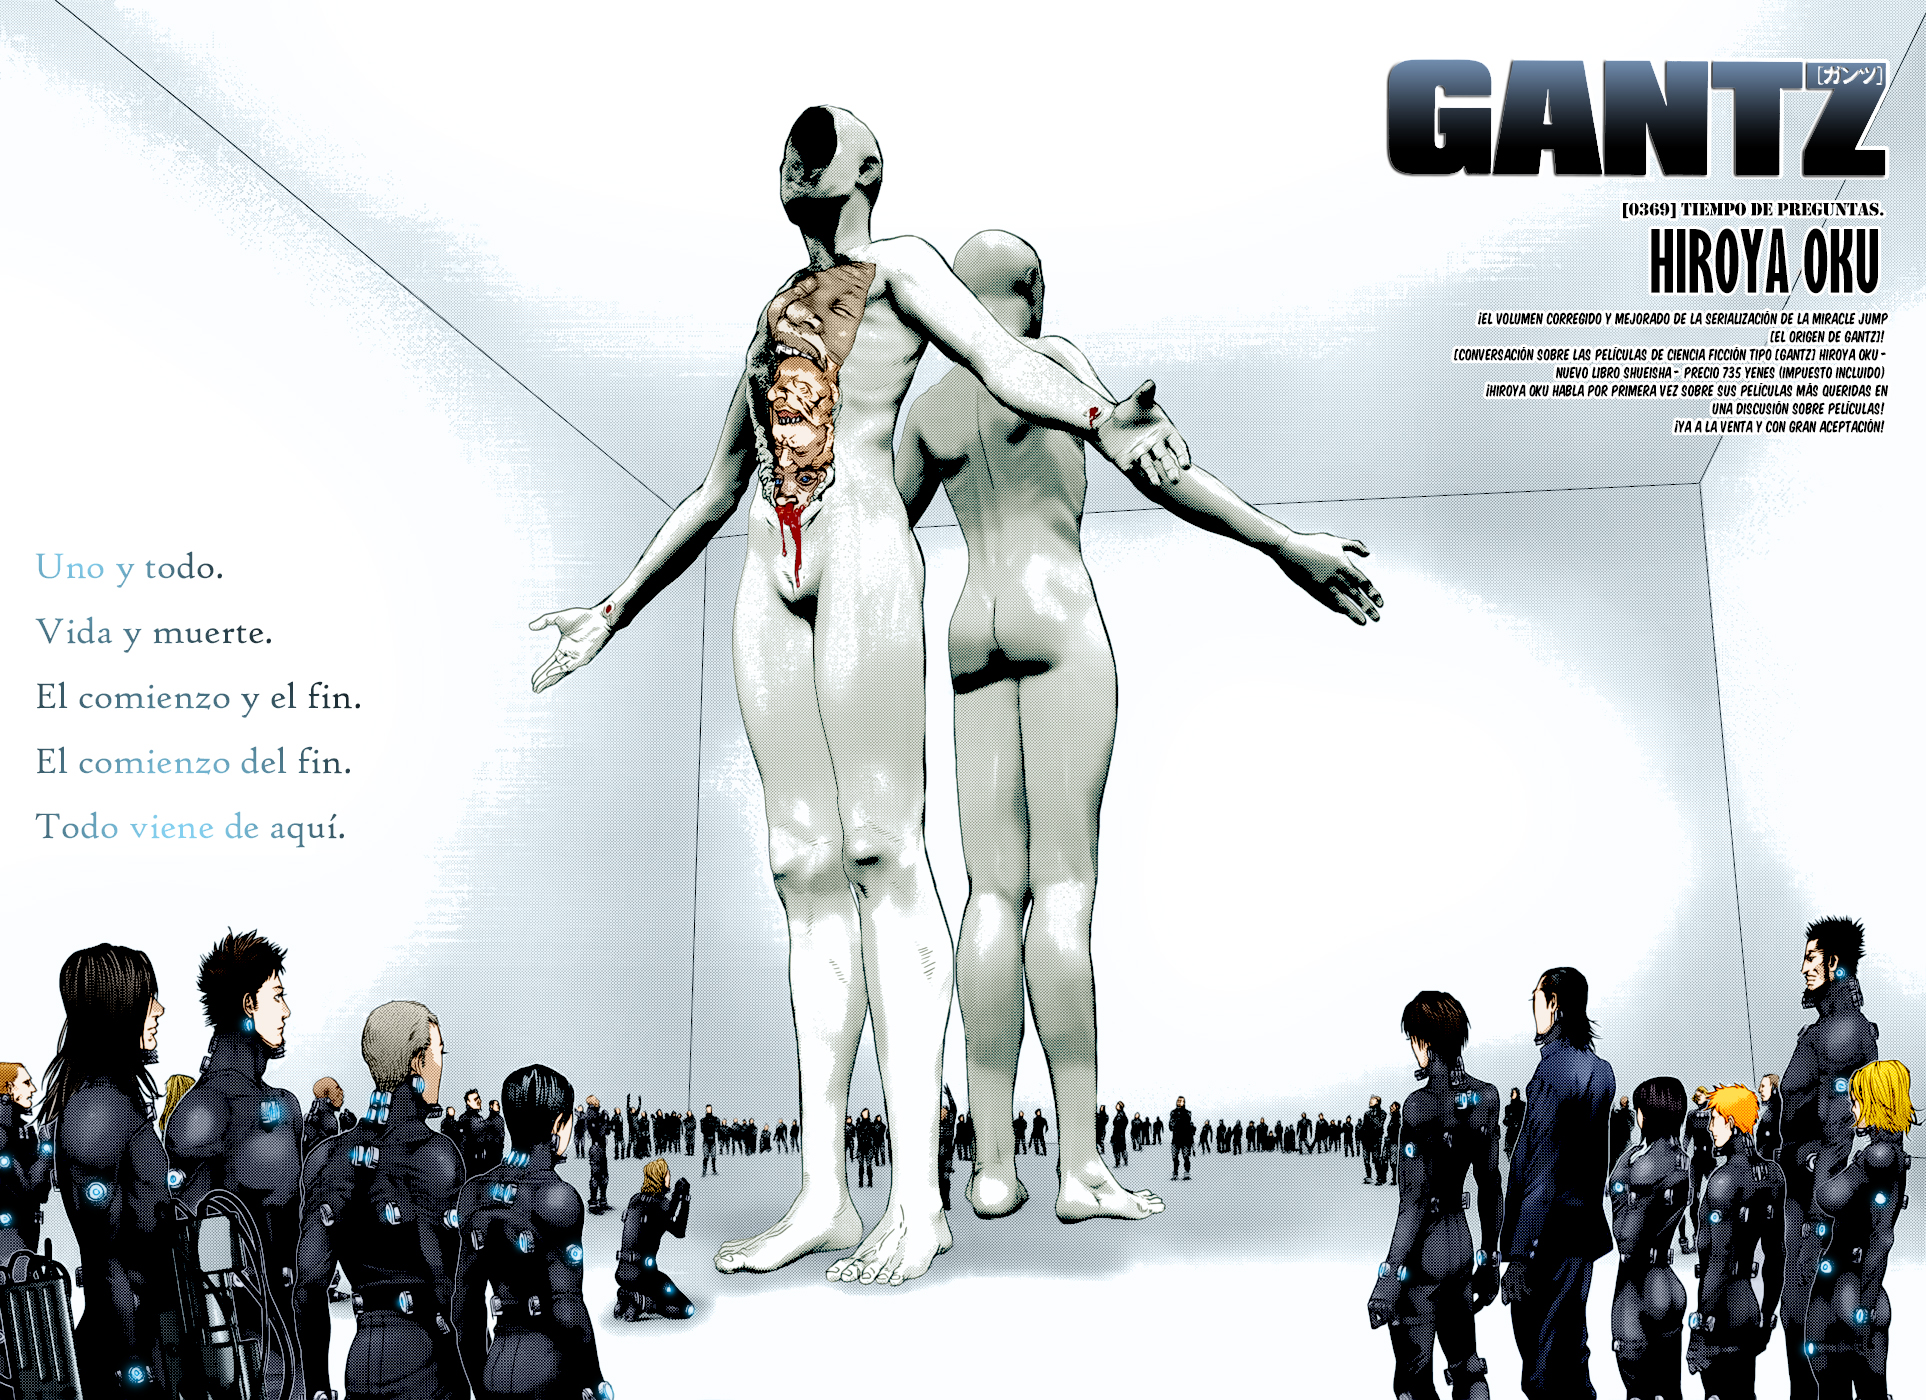 Gantz.1 Revelaciones Gantz_369_the_room_of_truth_by_brkheaven-d5es3cl